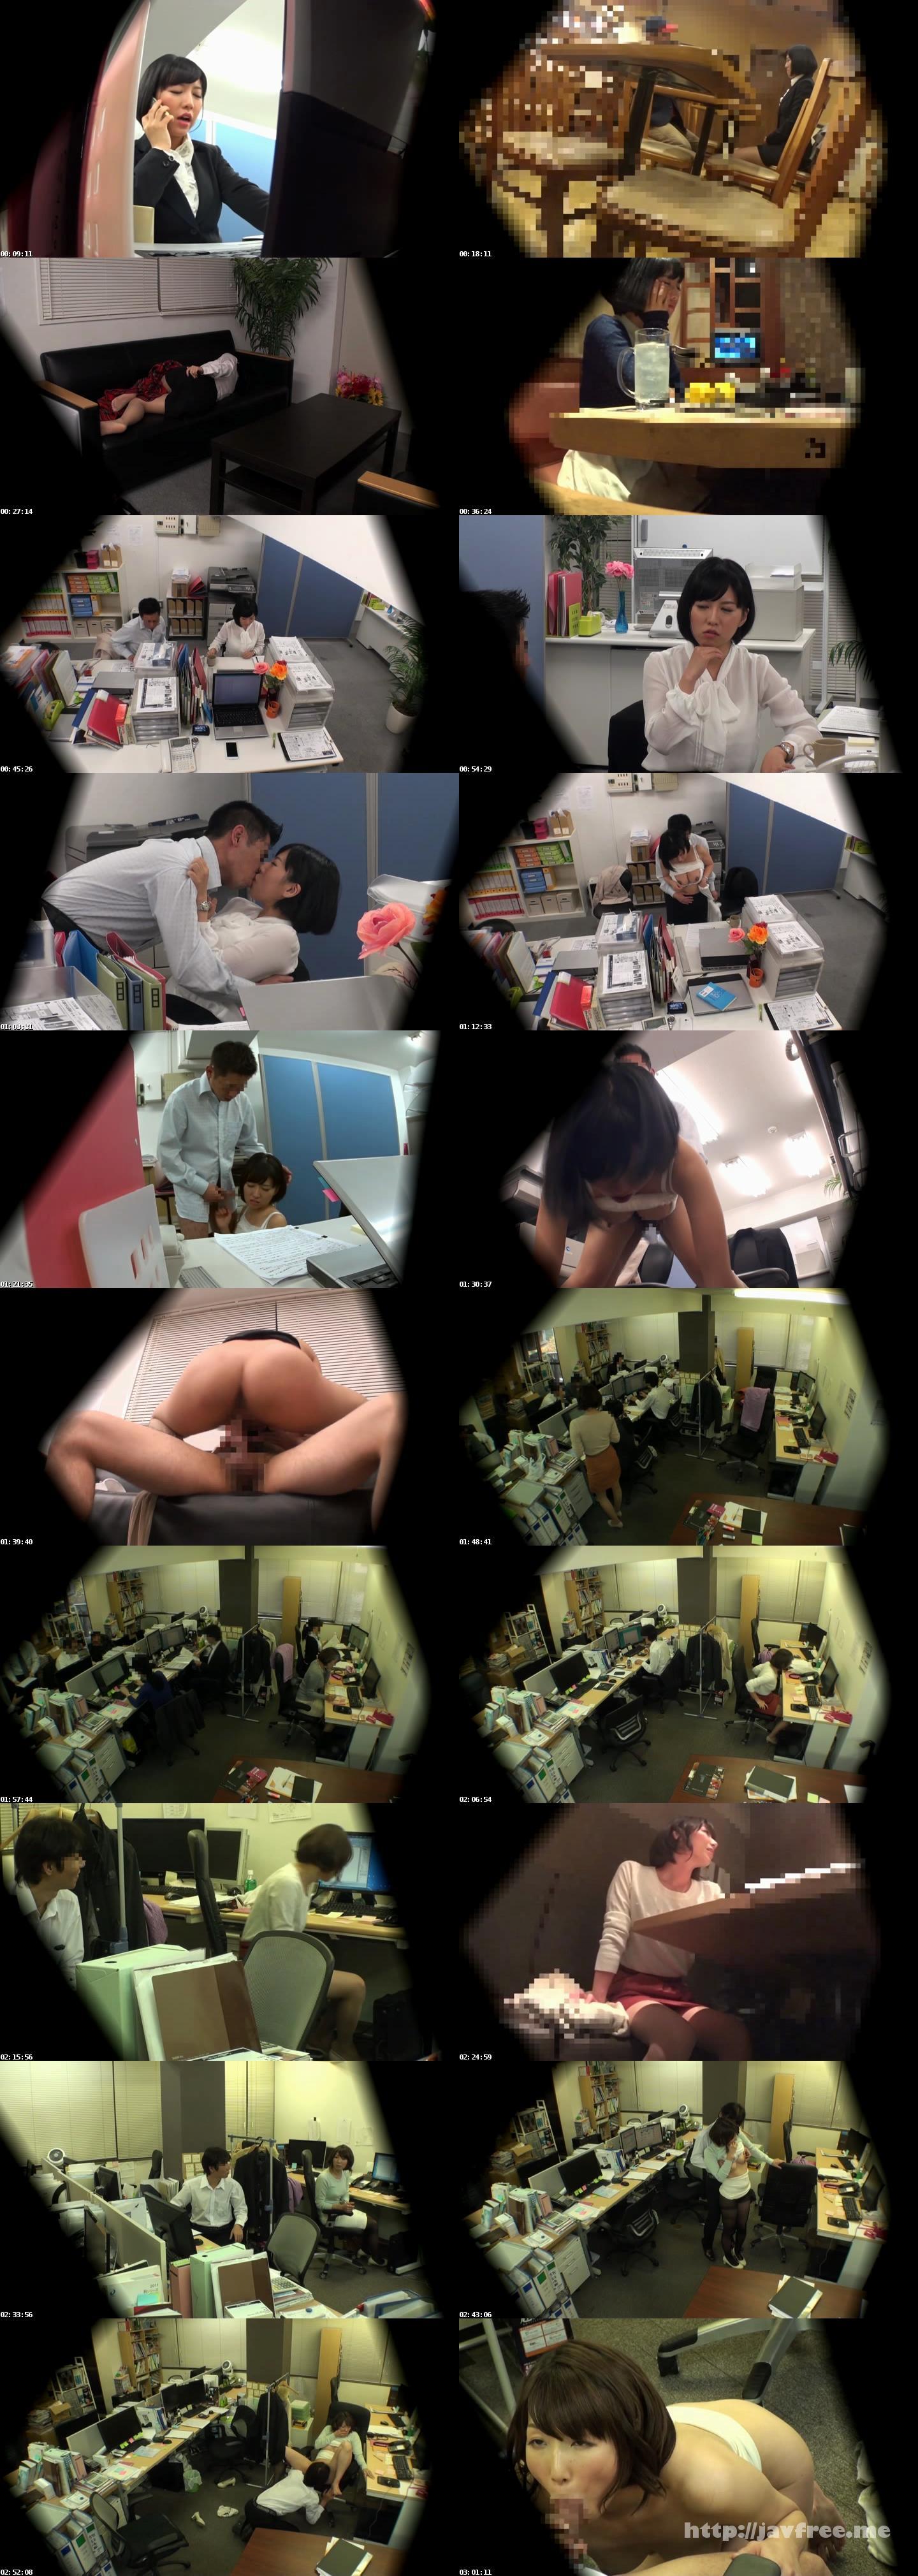 [DVDES 815] 巨乳の上司と職場でセックスしたい…2人きりのオフィスで残業中に部下のイケナイ欲望を告白された年上の女子社員は身体を許してしまうのか!?バレたら即懲戒免職の社内盗撮でそのヤリたい願望をAV制作会社が完全バックアップ!! DVDES